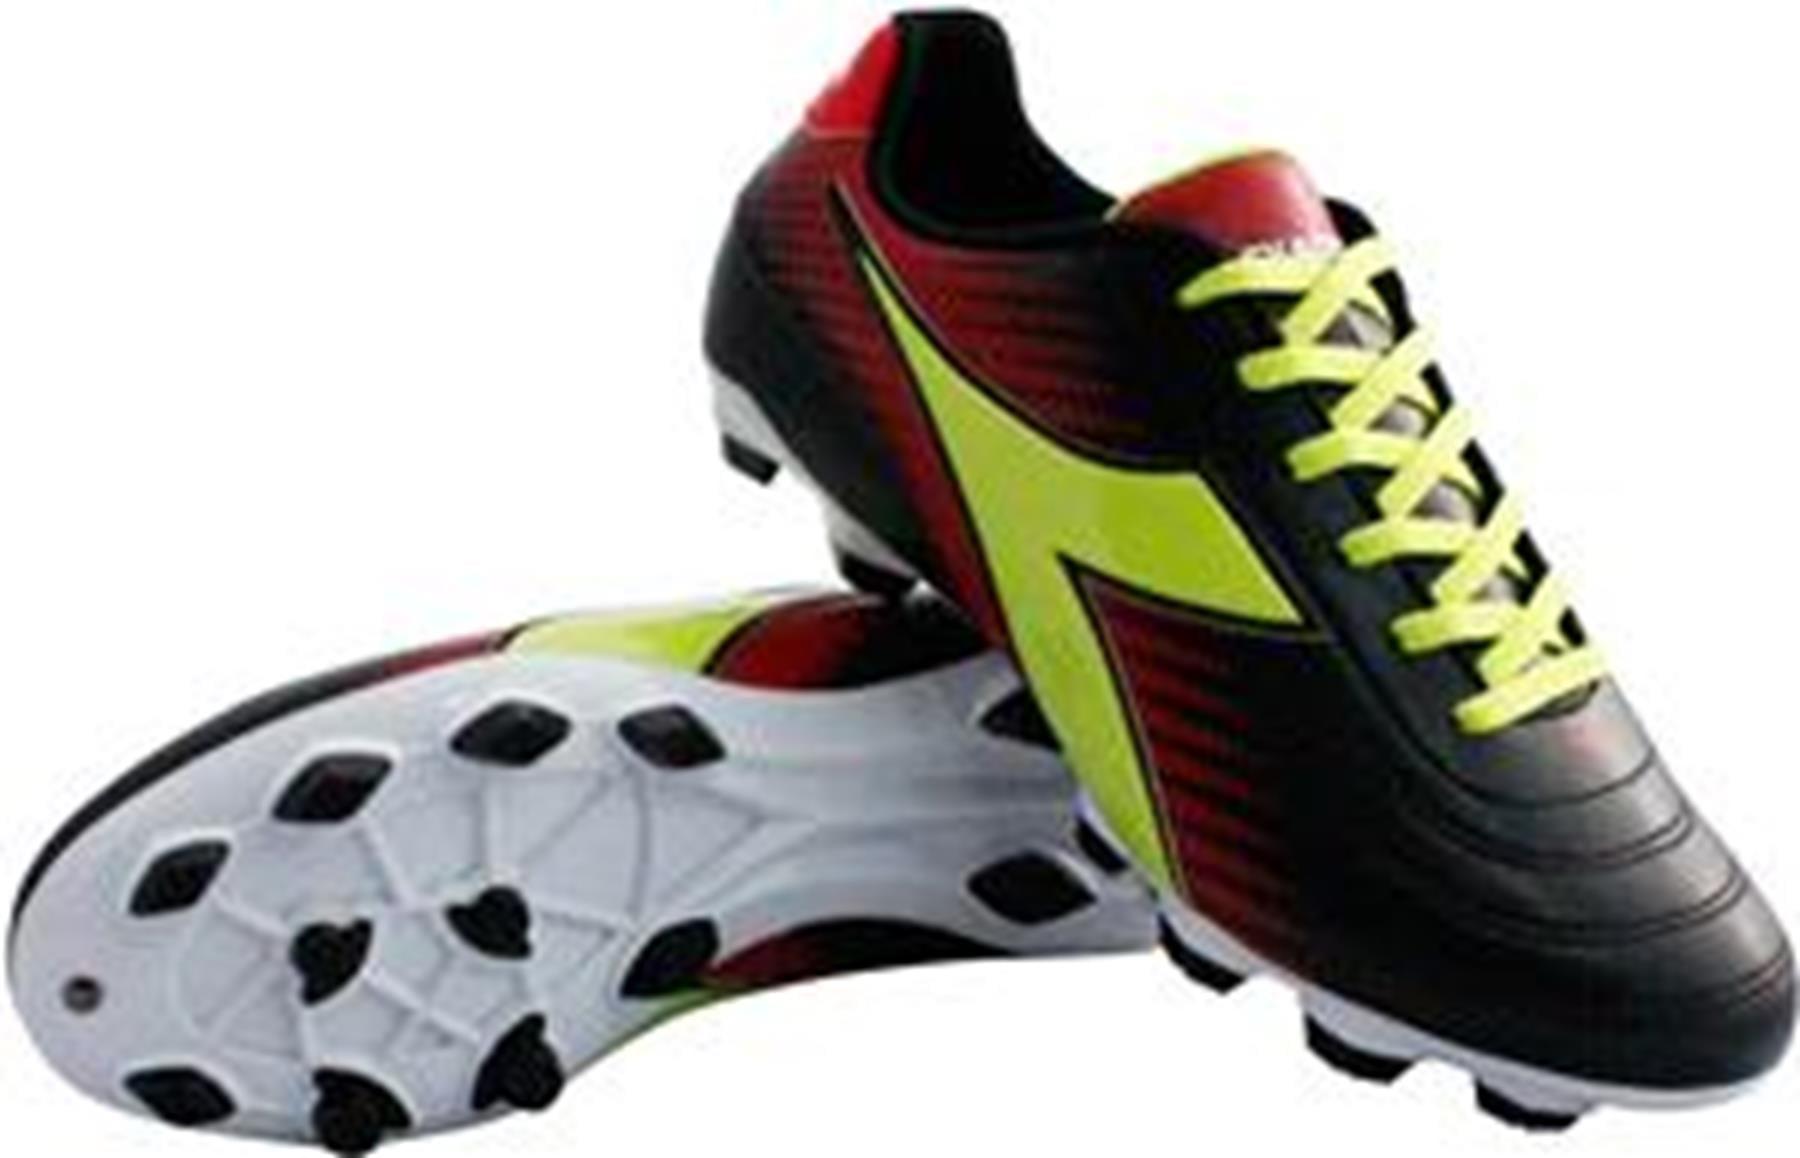 Women's Diadora Mago R LPU Soccer Cleat